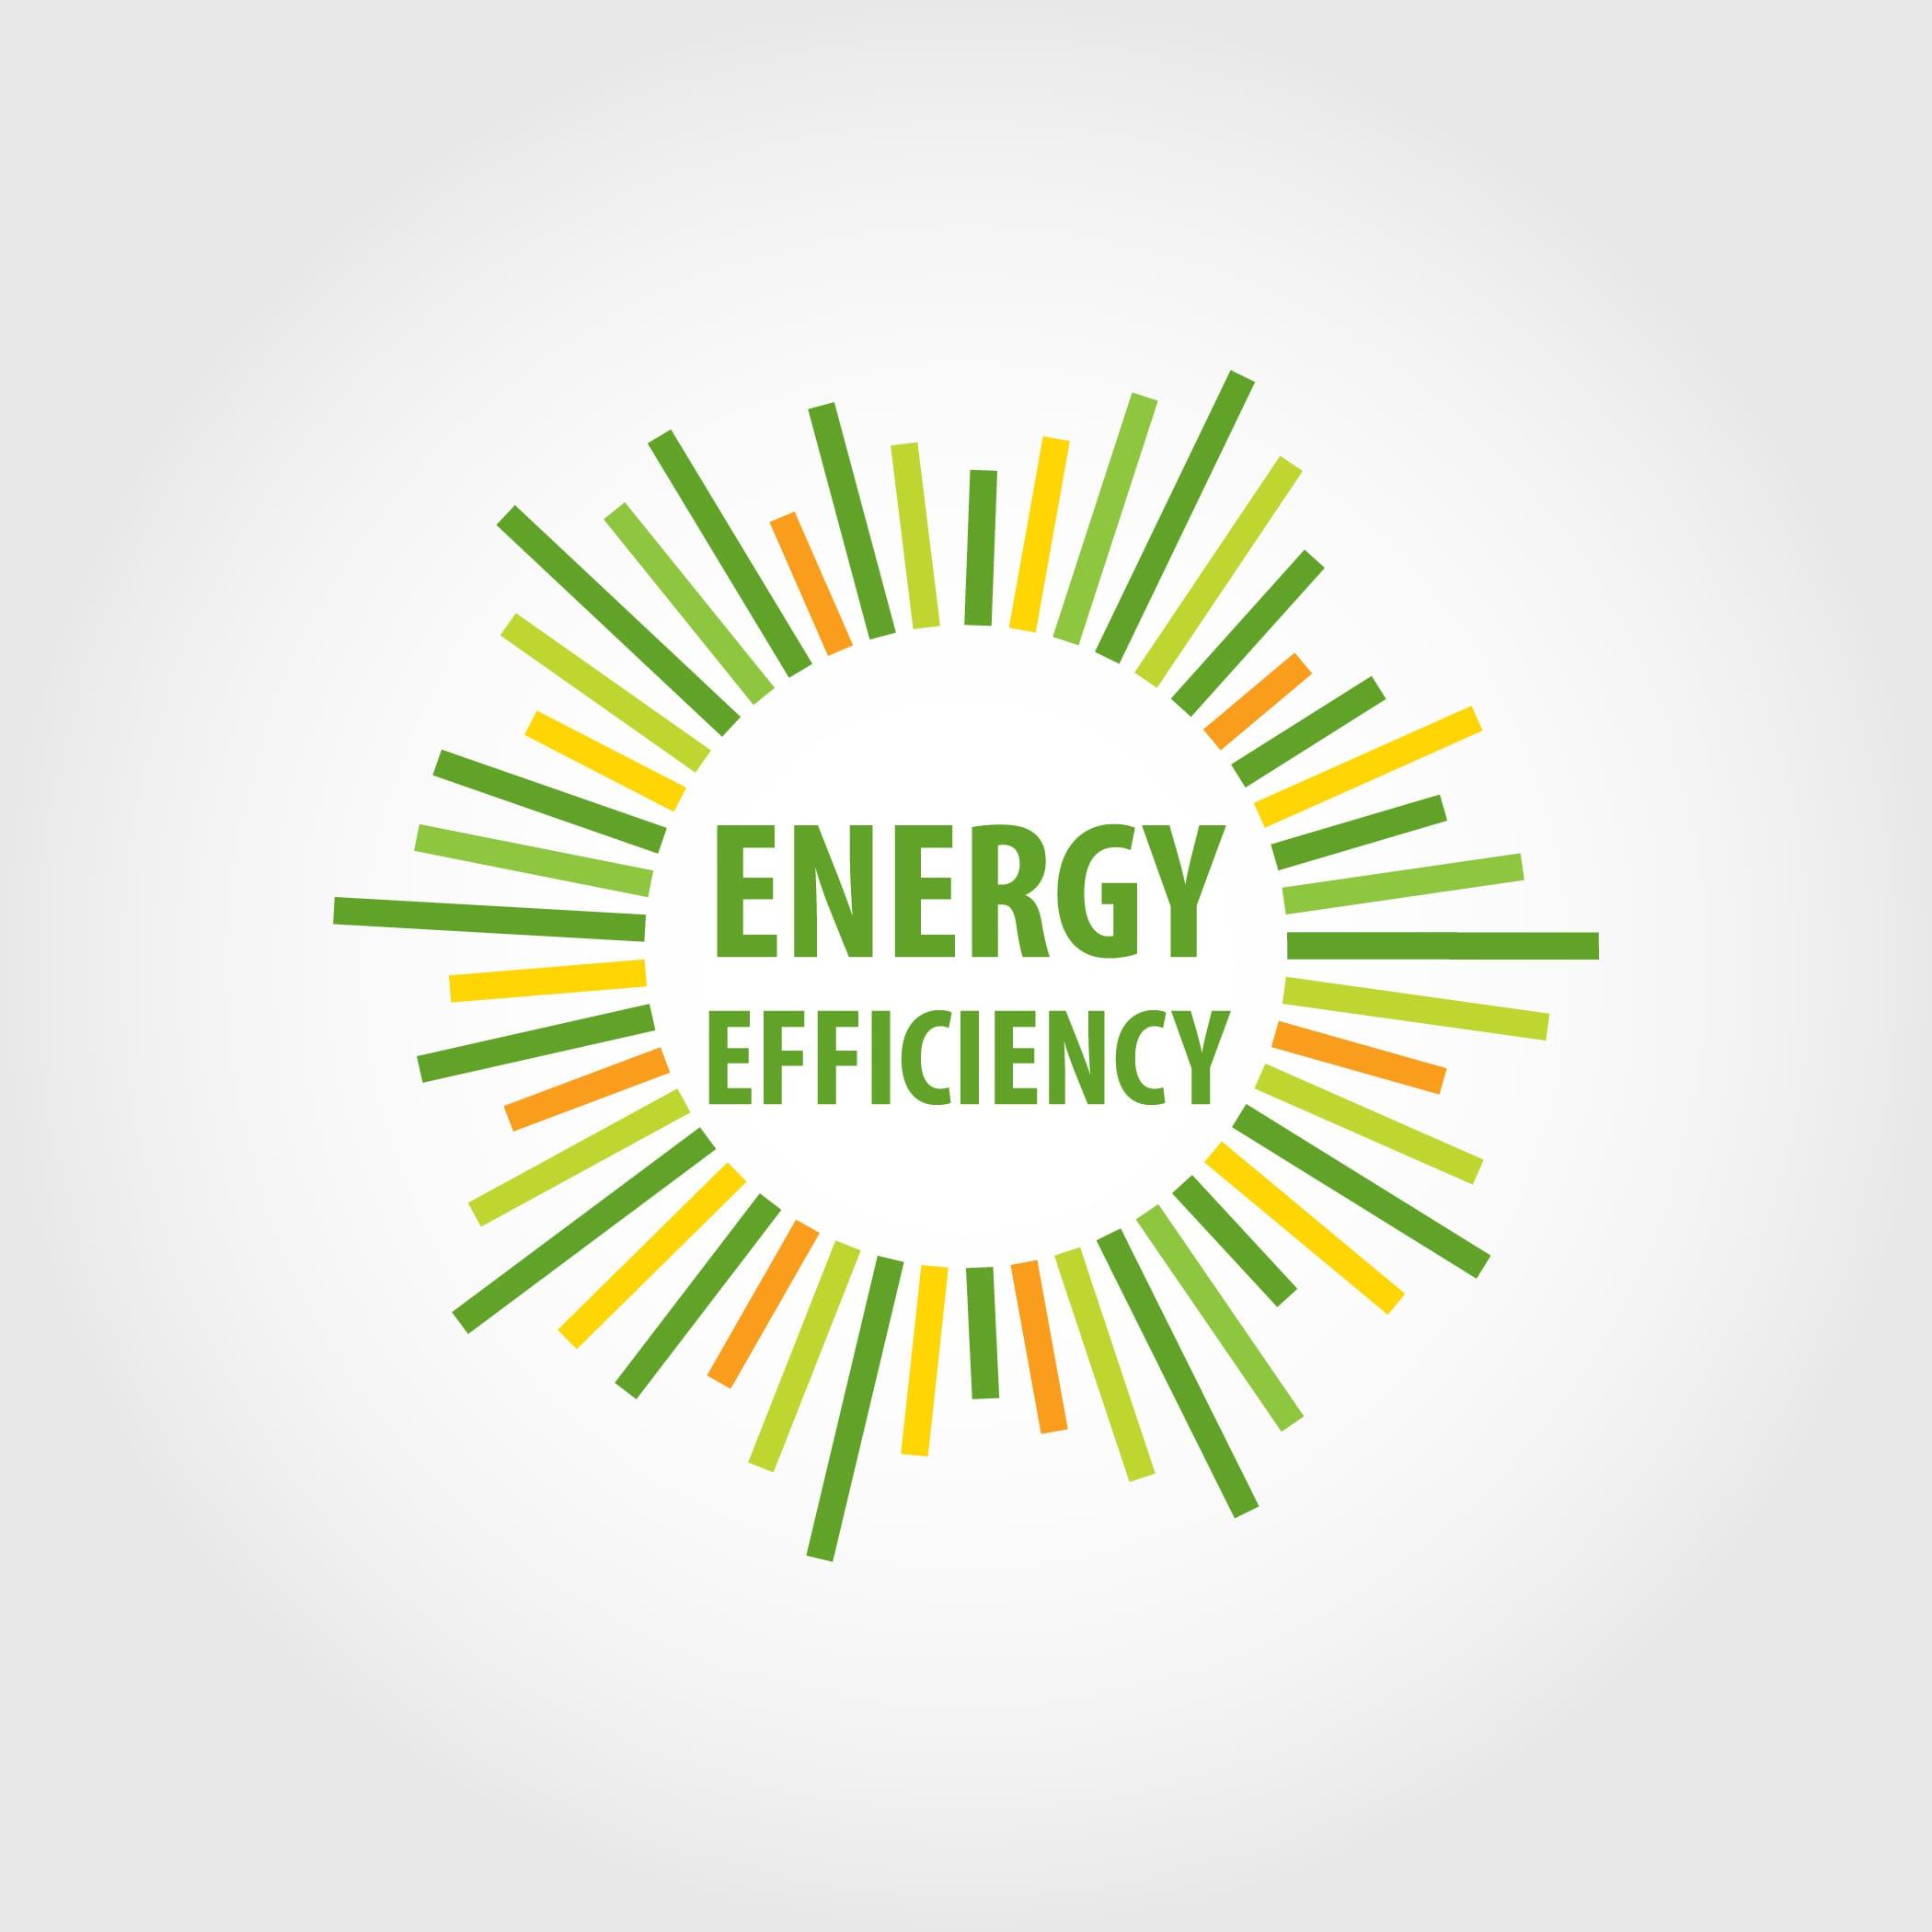 Cos'è l'efficienza energetica